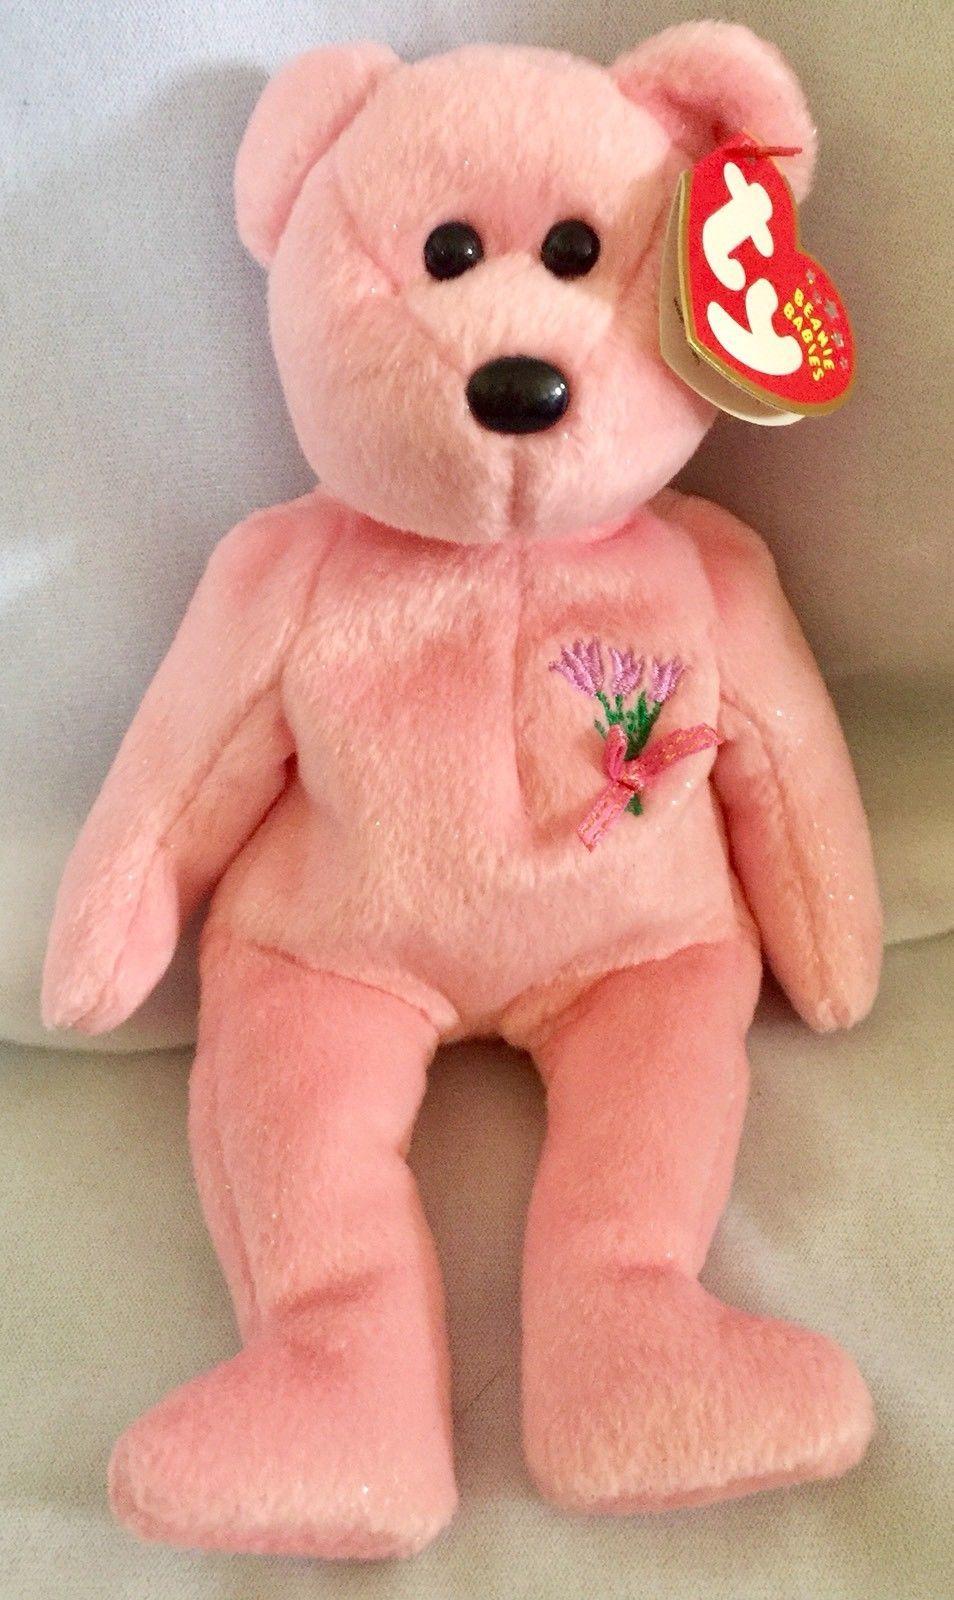 "5e9c2822e63 8"" Ty Beanie Baby Mum The Pink Bear Plush and 22 similar items. S l1600"